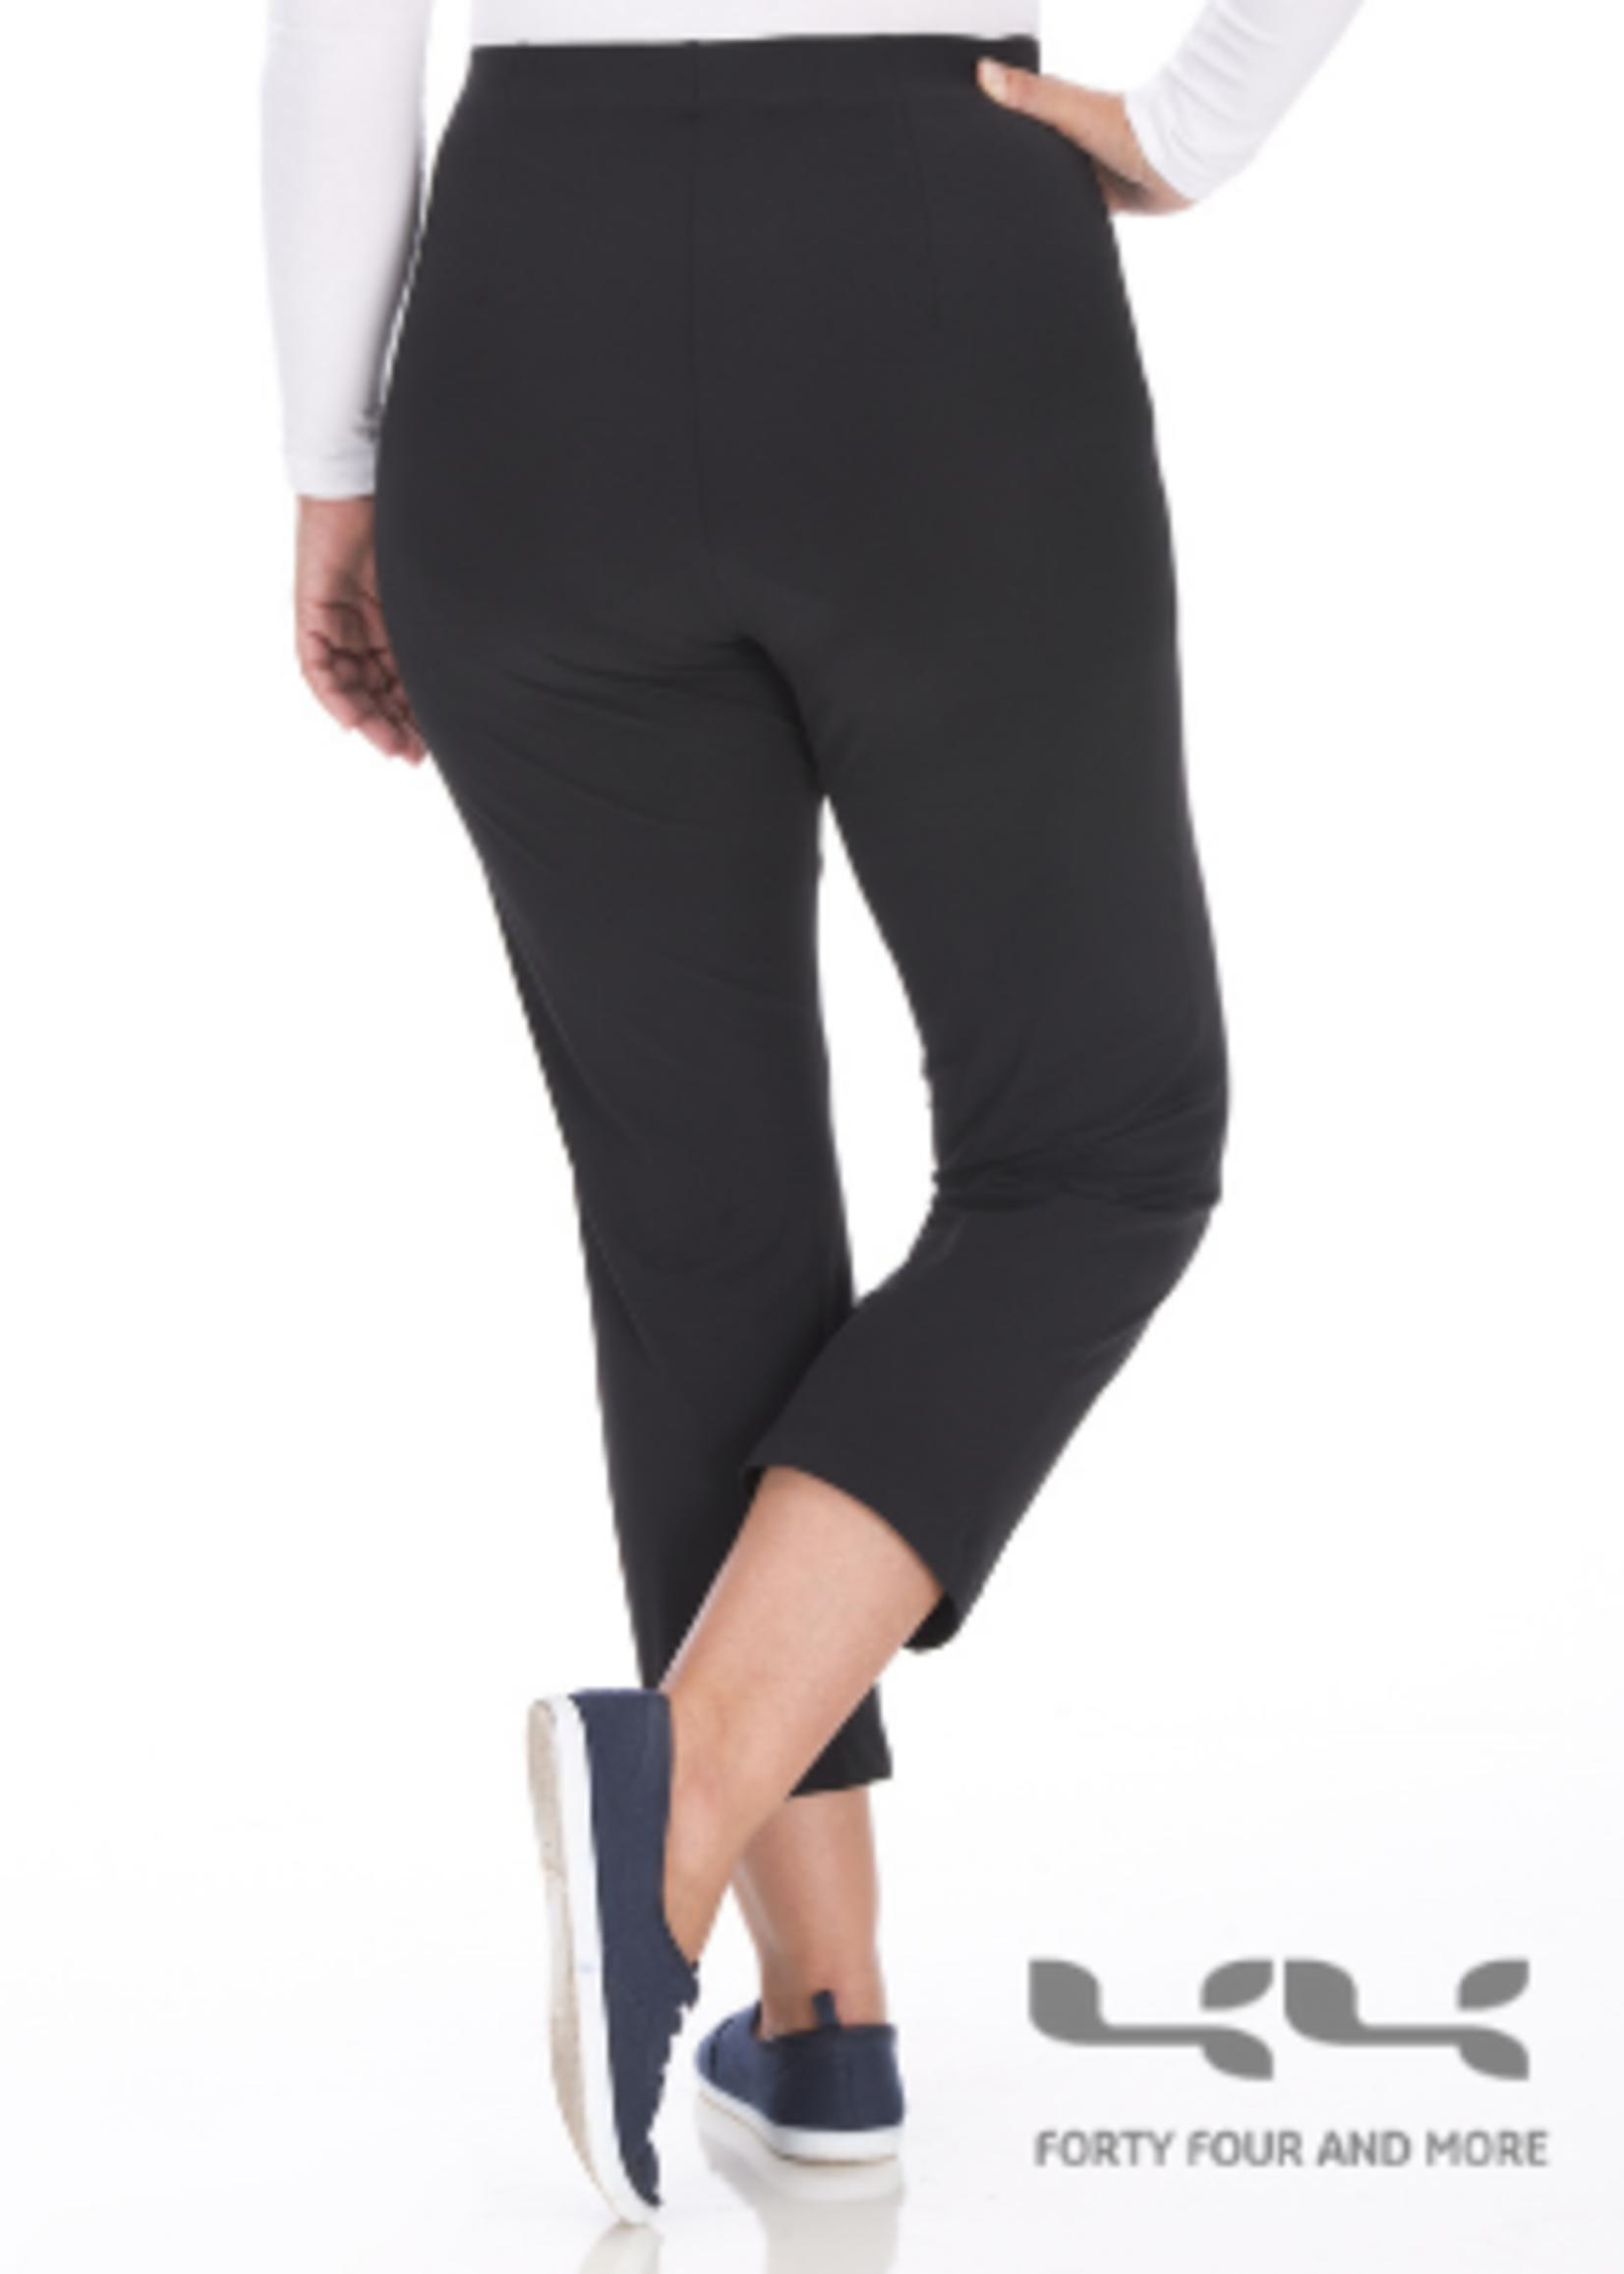 KJBrand 29826 6086 Susie pantalon 7/8 Sensitive